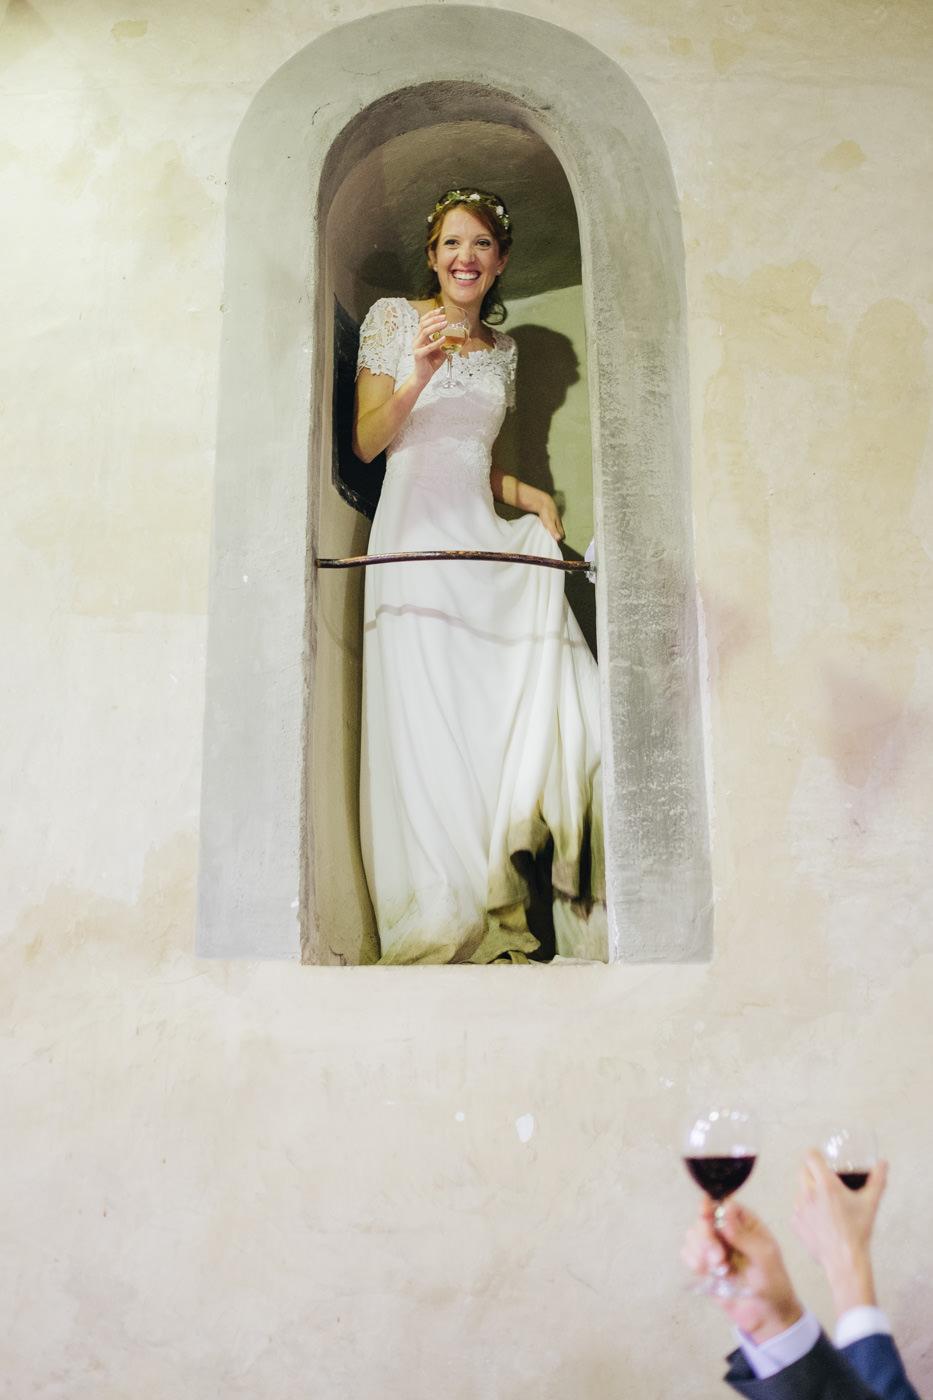 matrimoni_all_italiana_fotografo_matrimonio_toscana-73.jpg